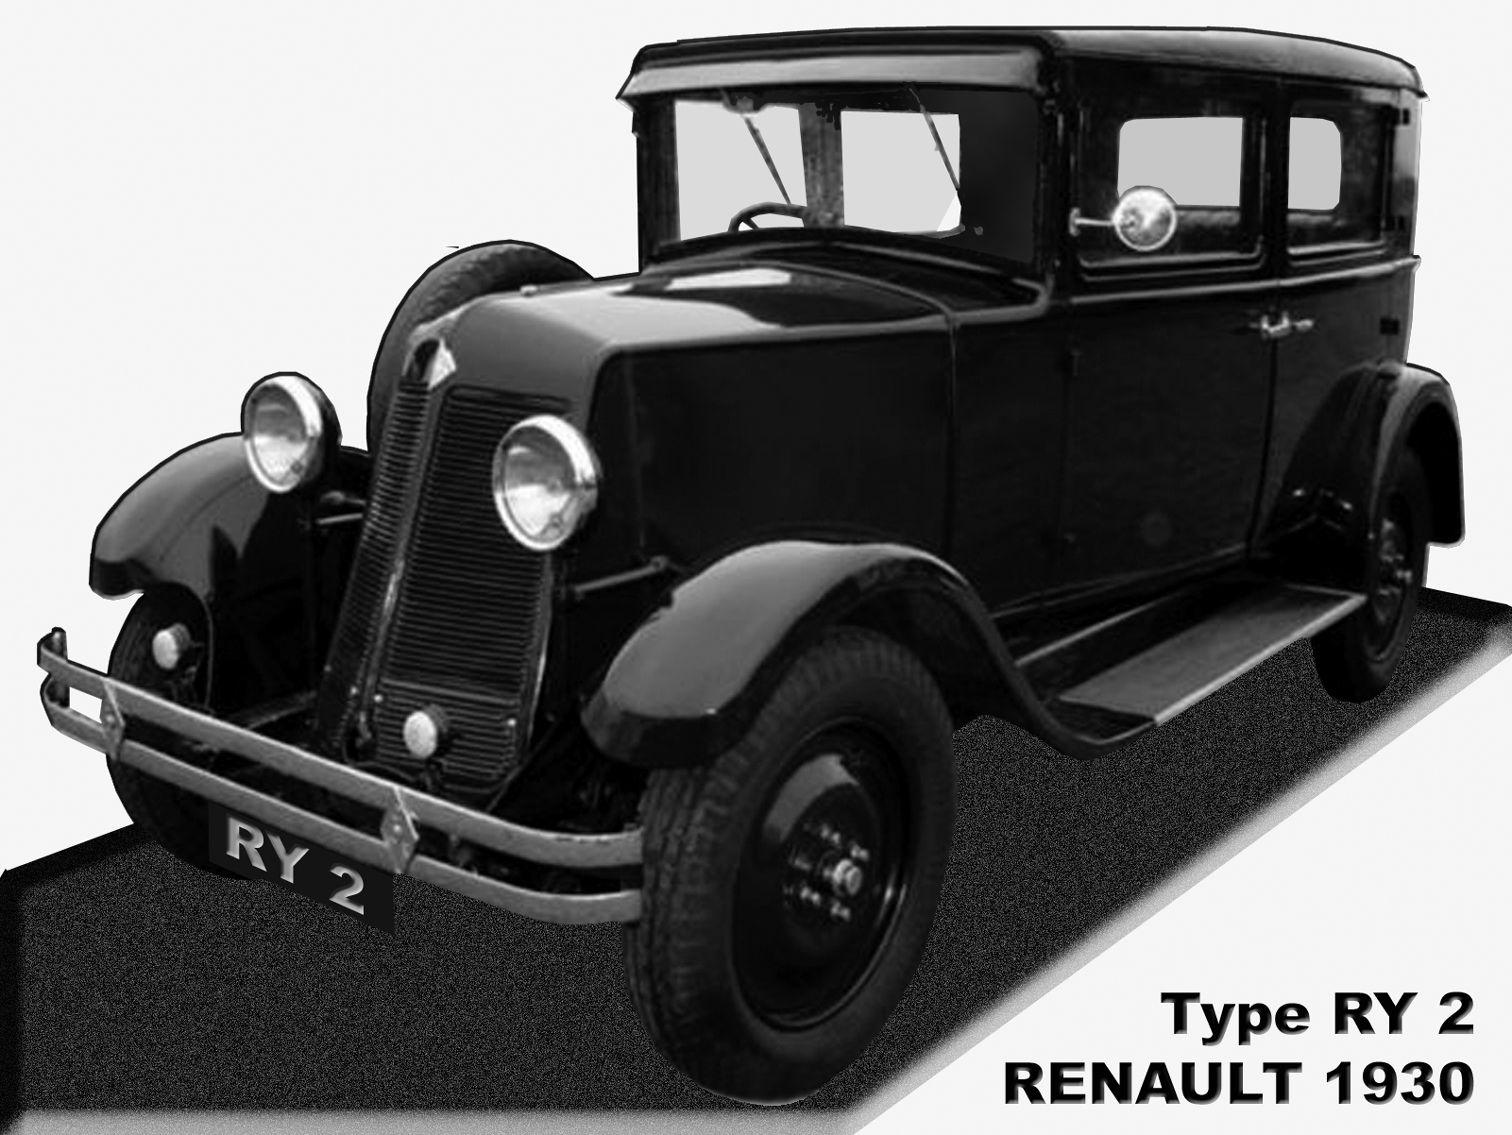 1930 Renault RY (Monasix) Veteranbilar